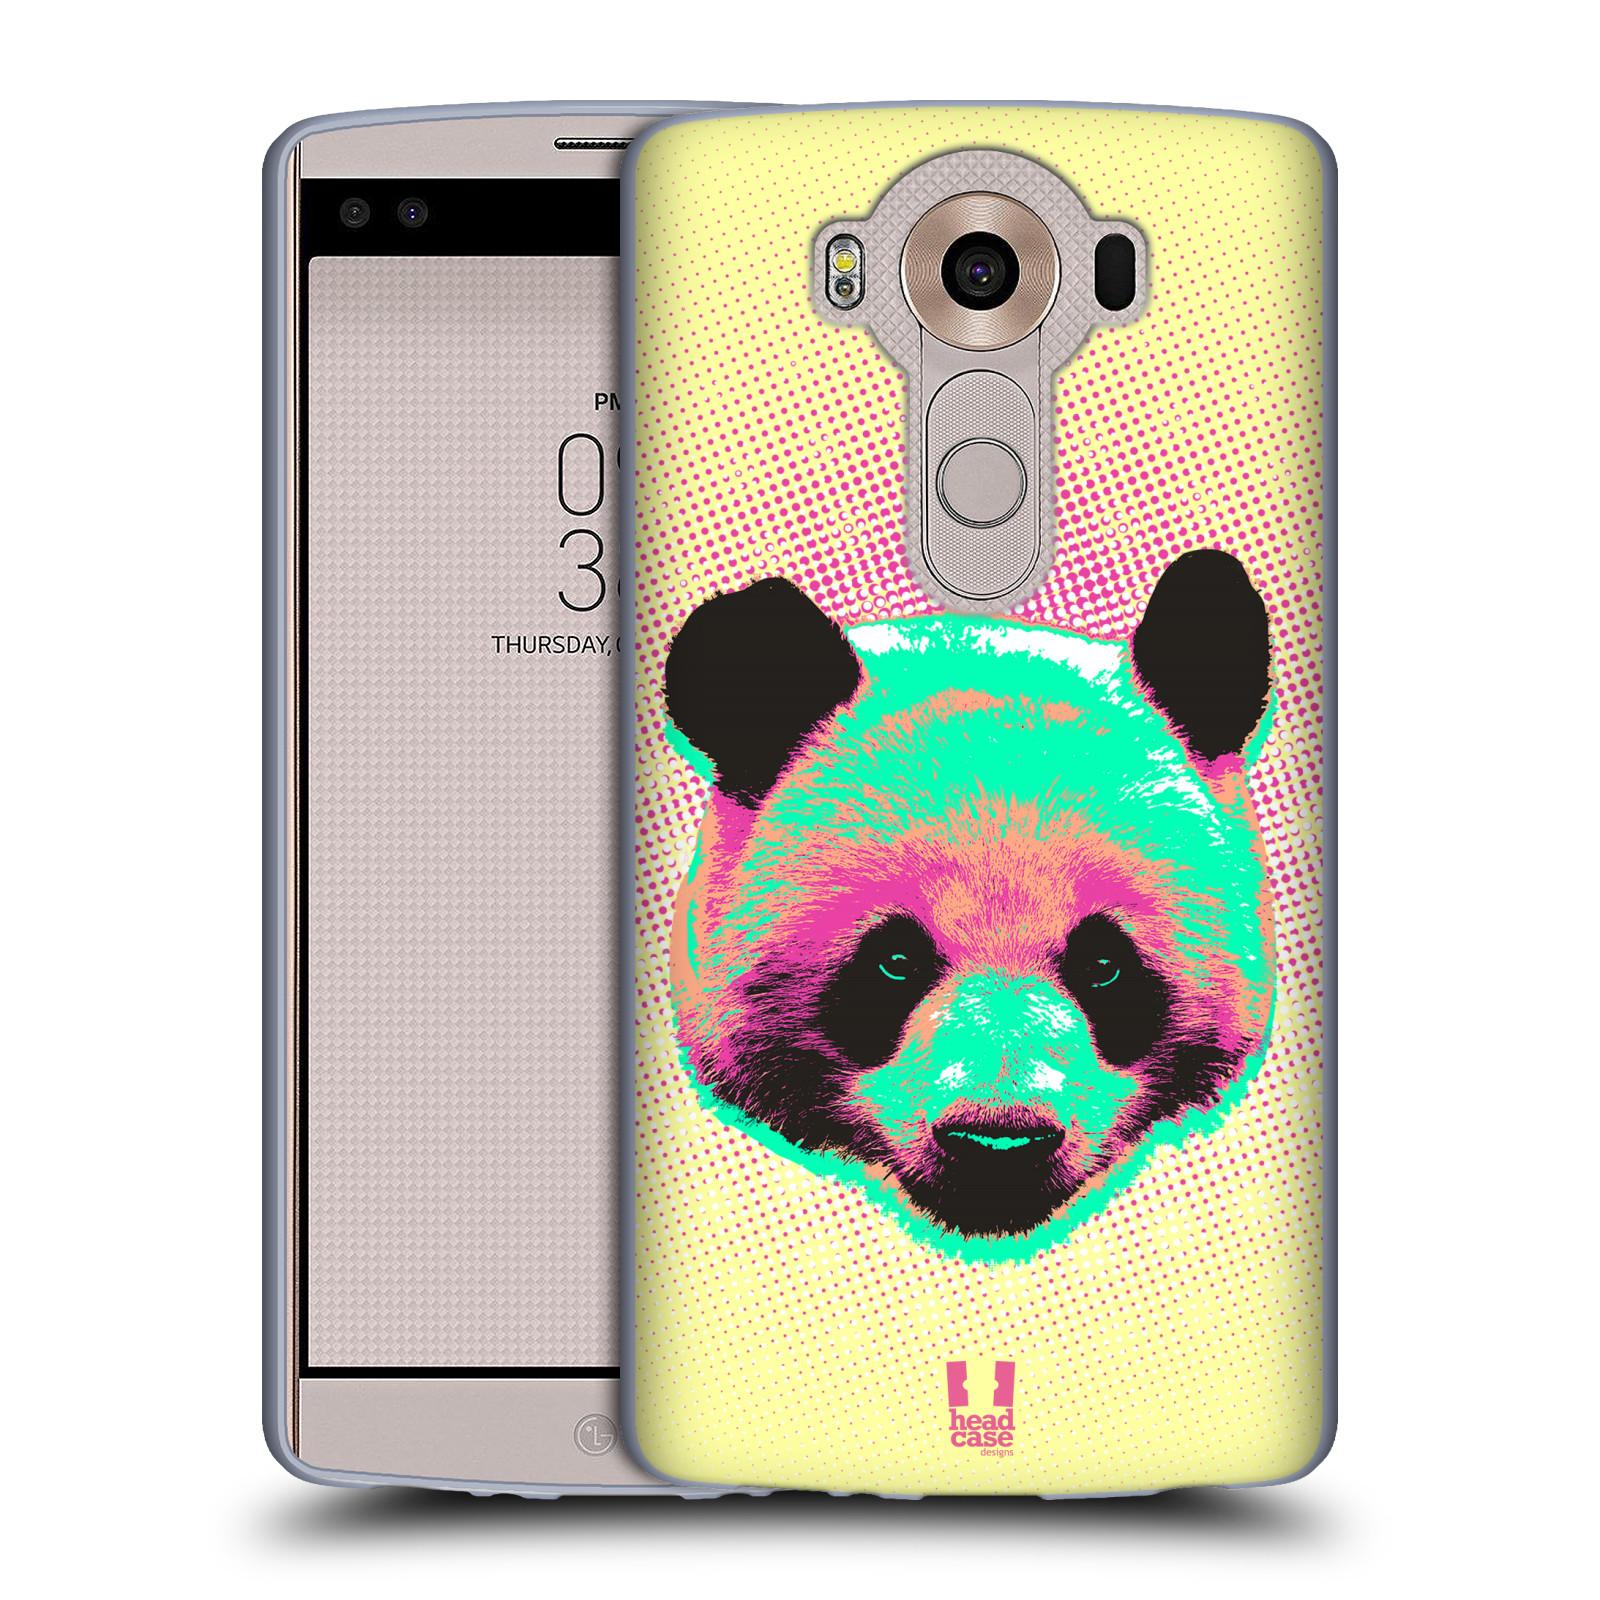 Silikonové pouzdro na mobil LG V10 HEAD CASE POP PRINT PANDA (Silikonový kryt či obal na mobilní telefon LG V10 H960 / H960A)